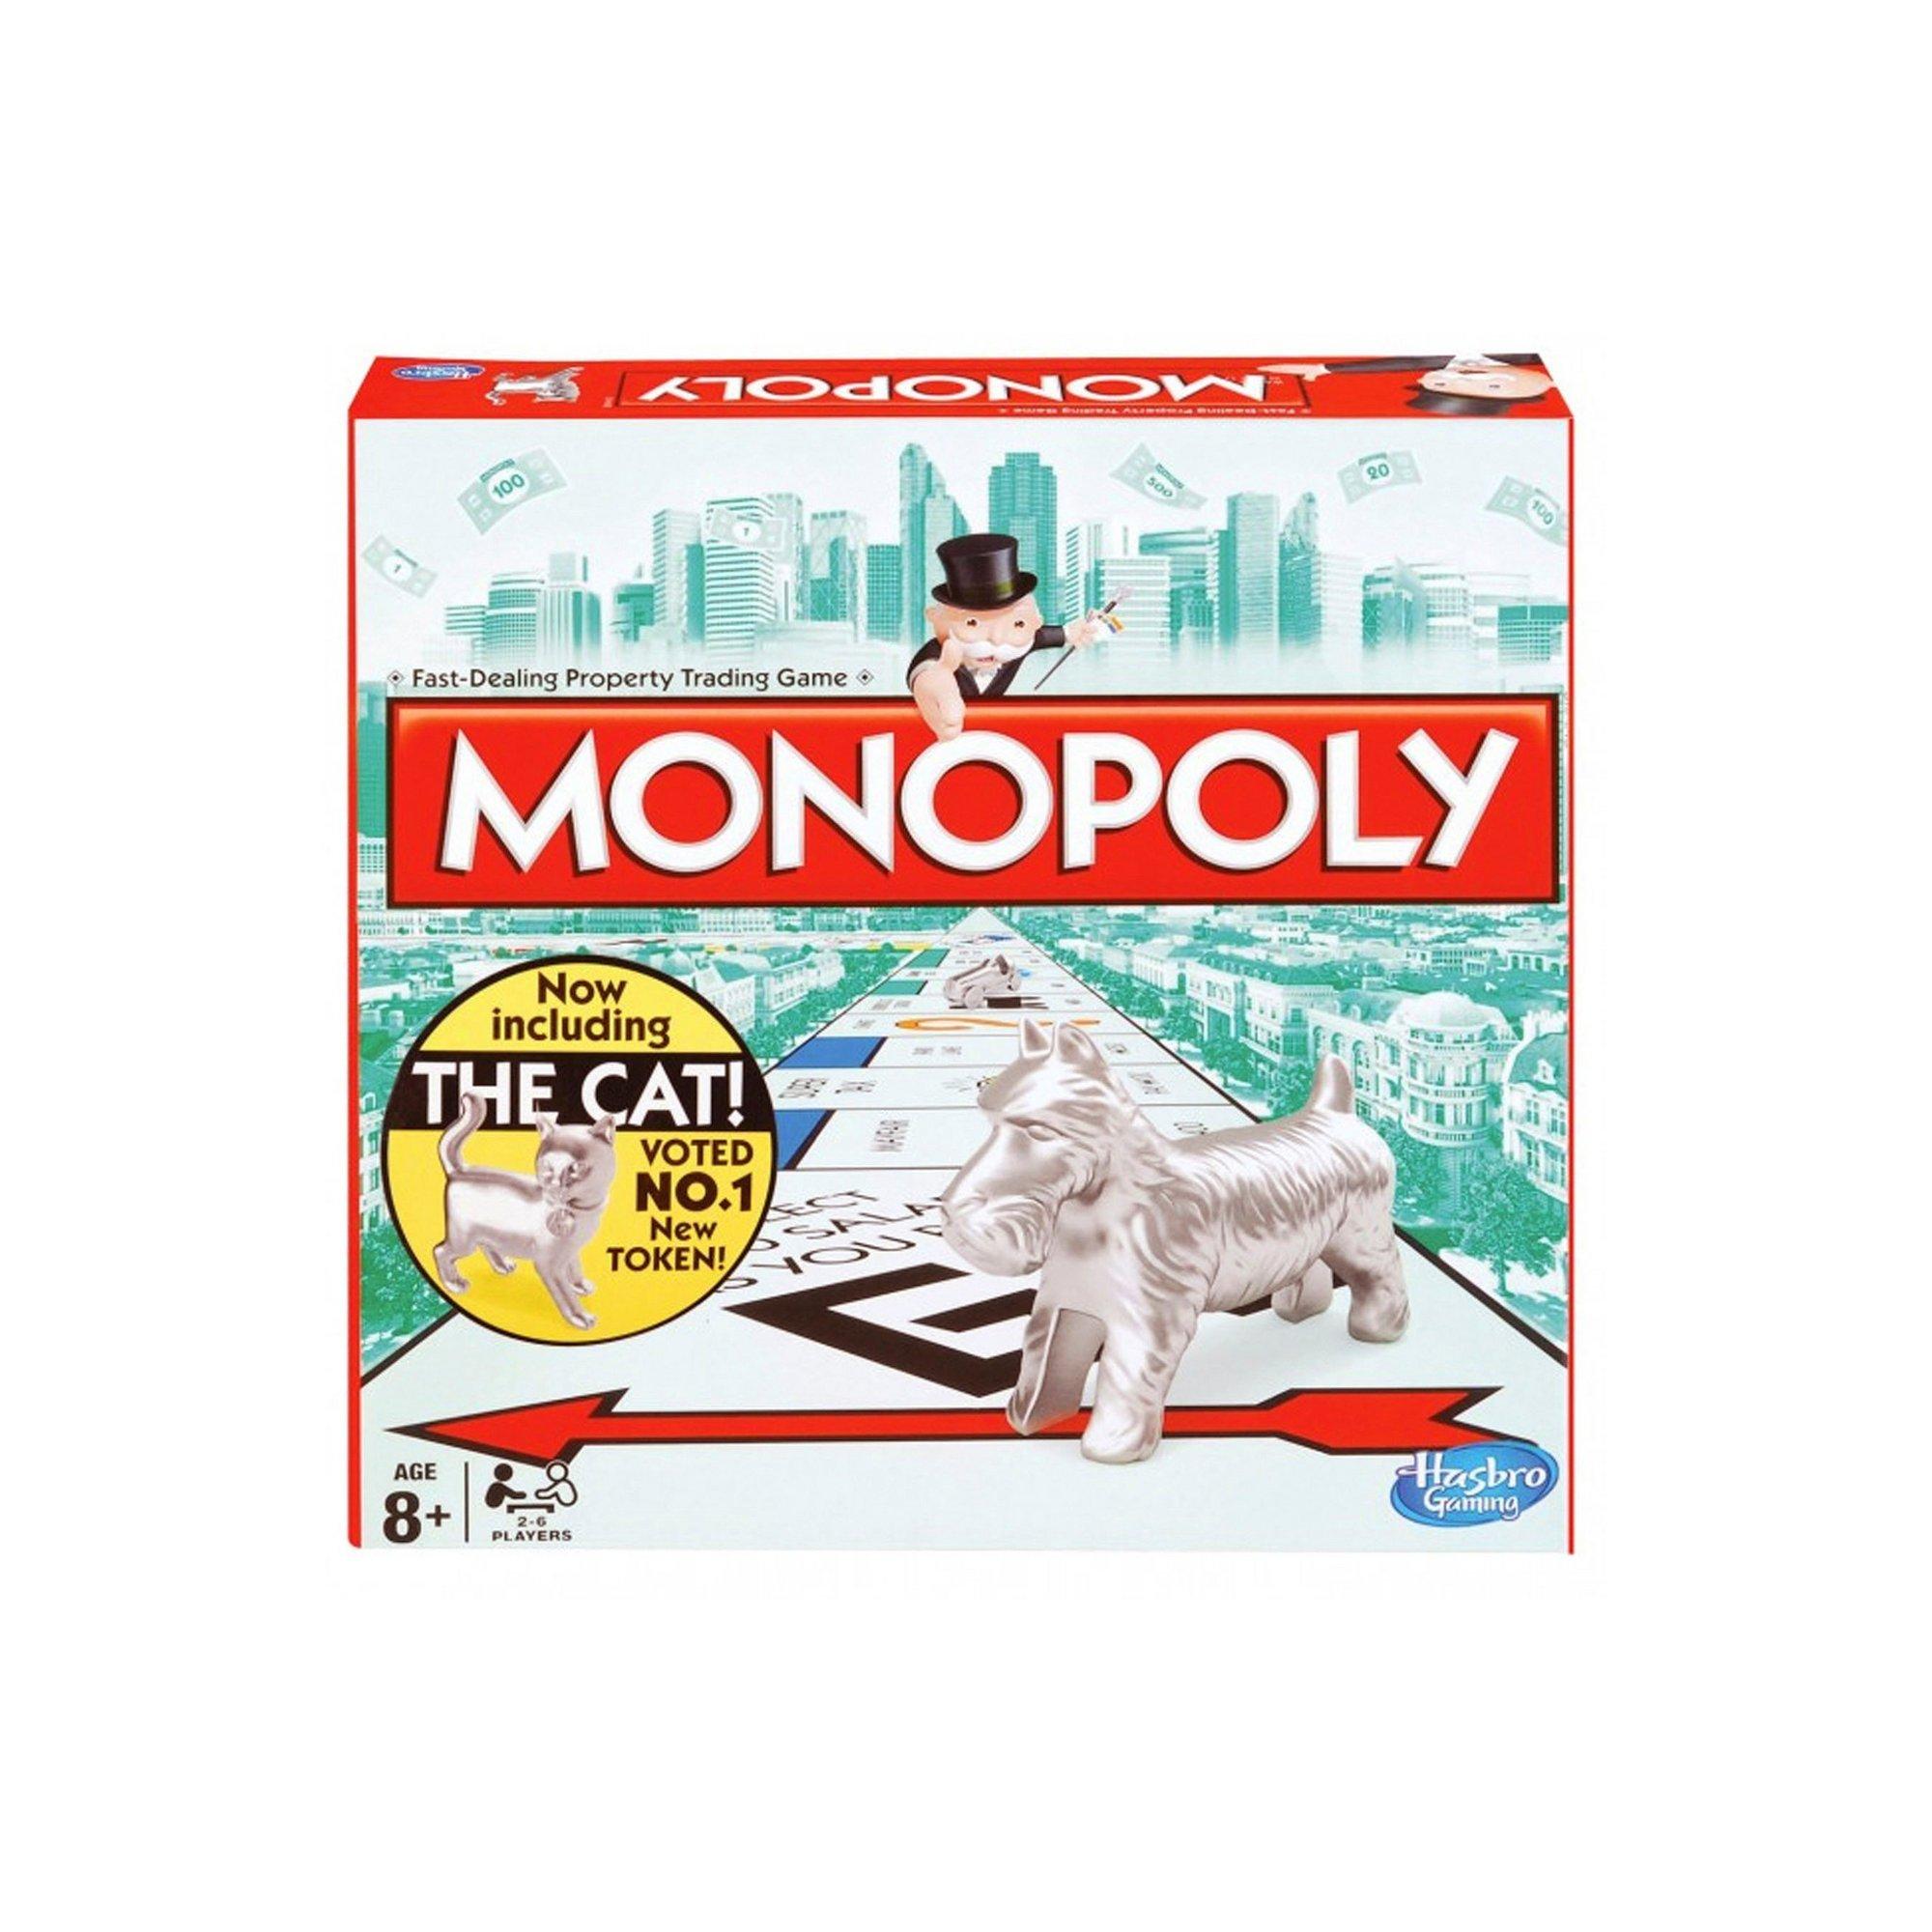 Image of Hasbro Classic Monopoly